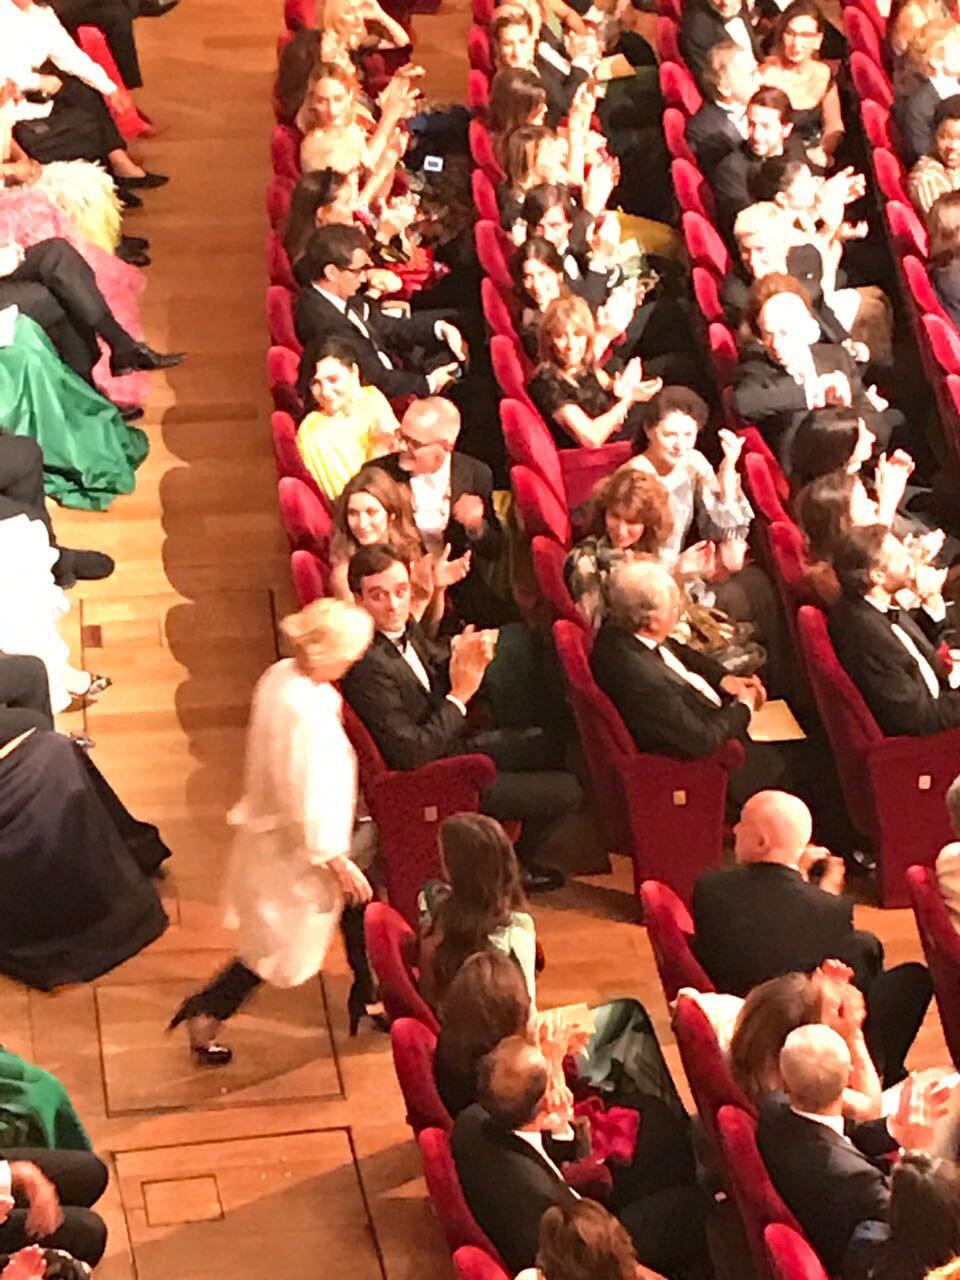 Gisele Bündchen na platéia do prêmio (Foto: Barbara Migliori)